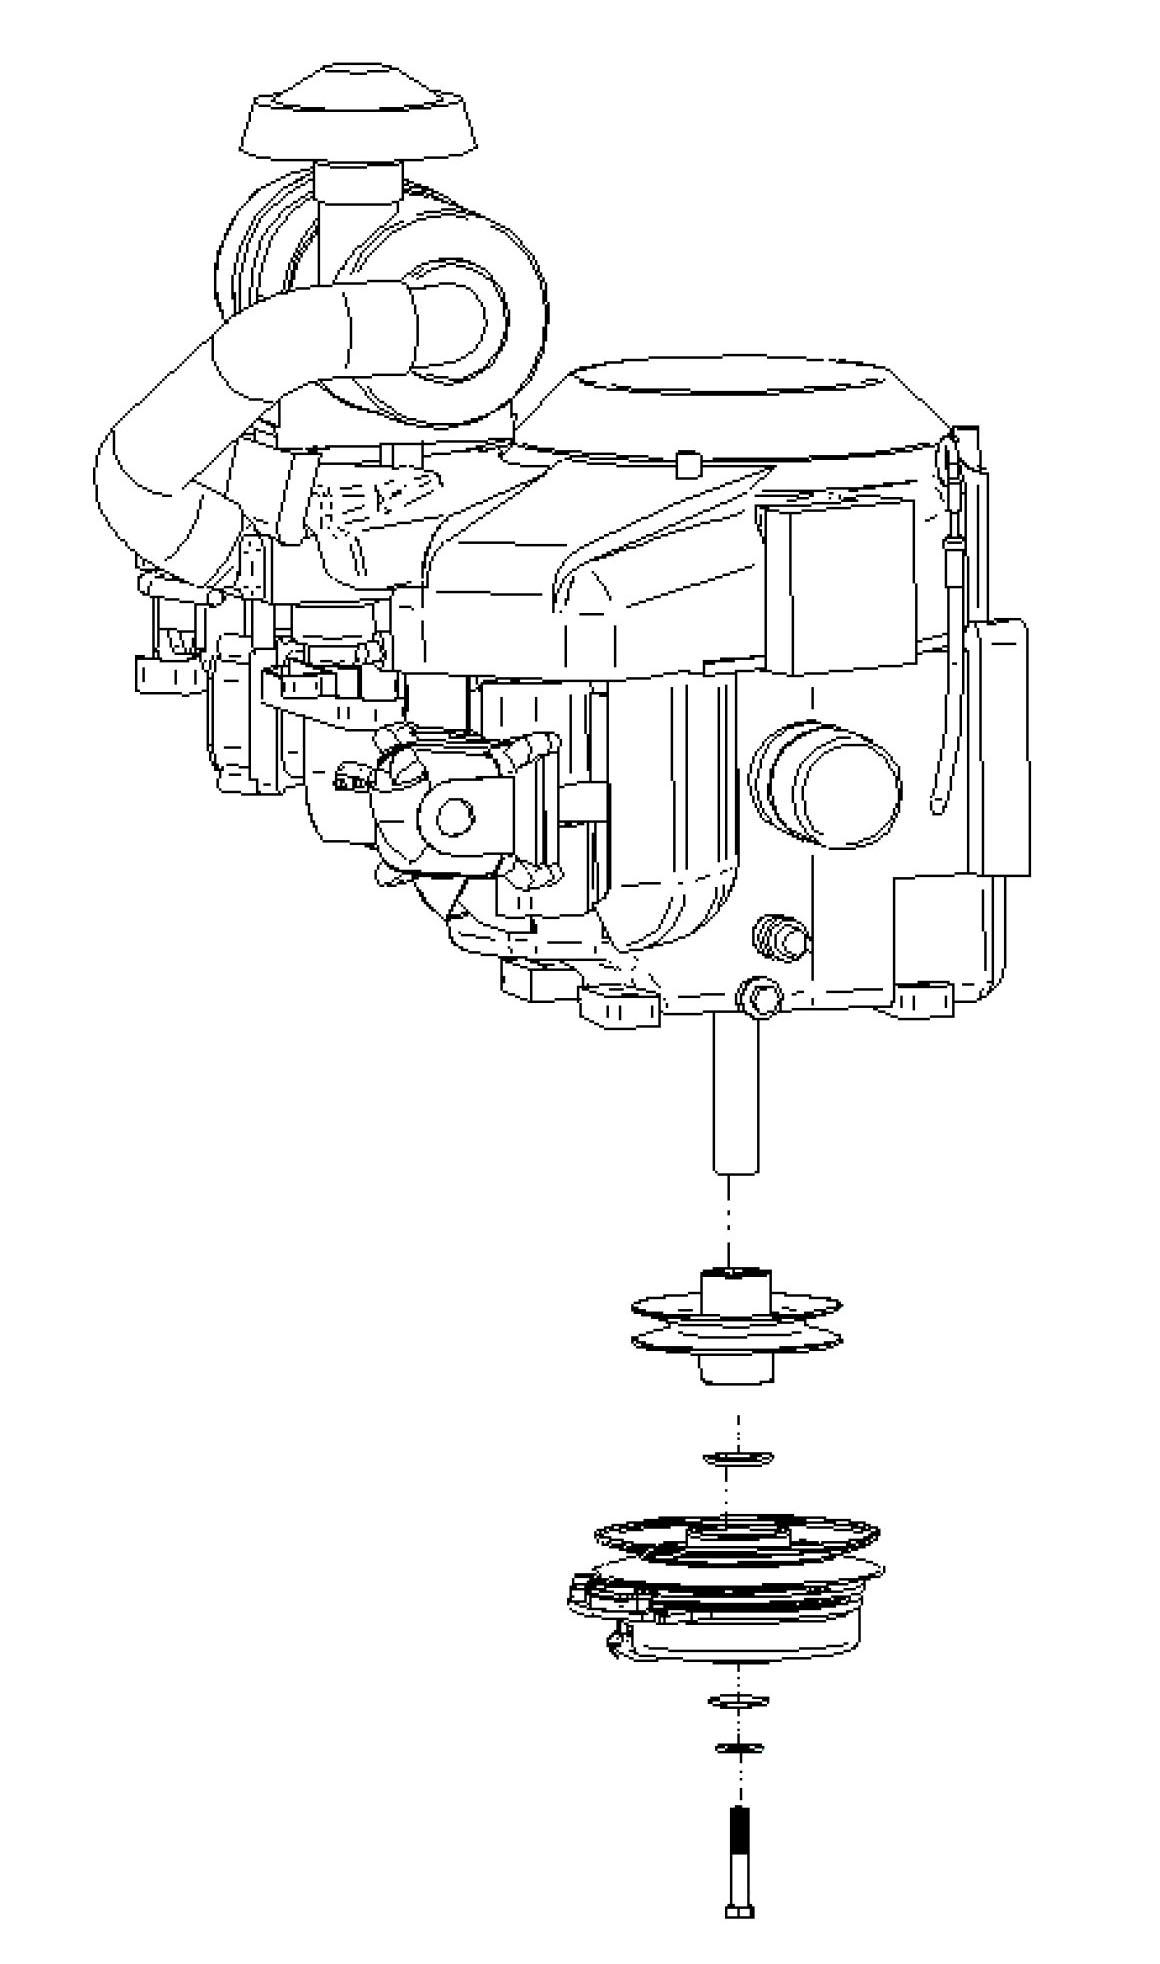 903277 Dixie Chopper Engine Kit for 36 HP Vanguard Manual